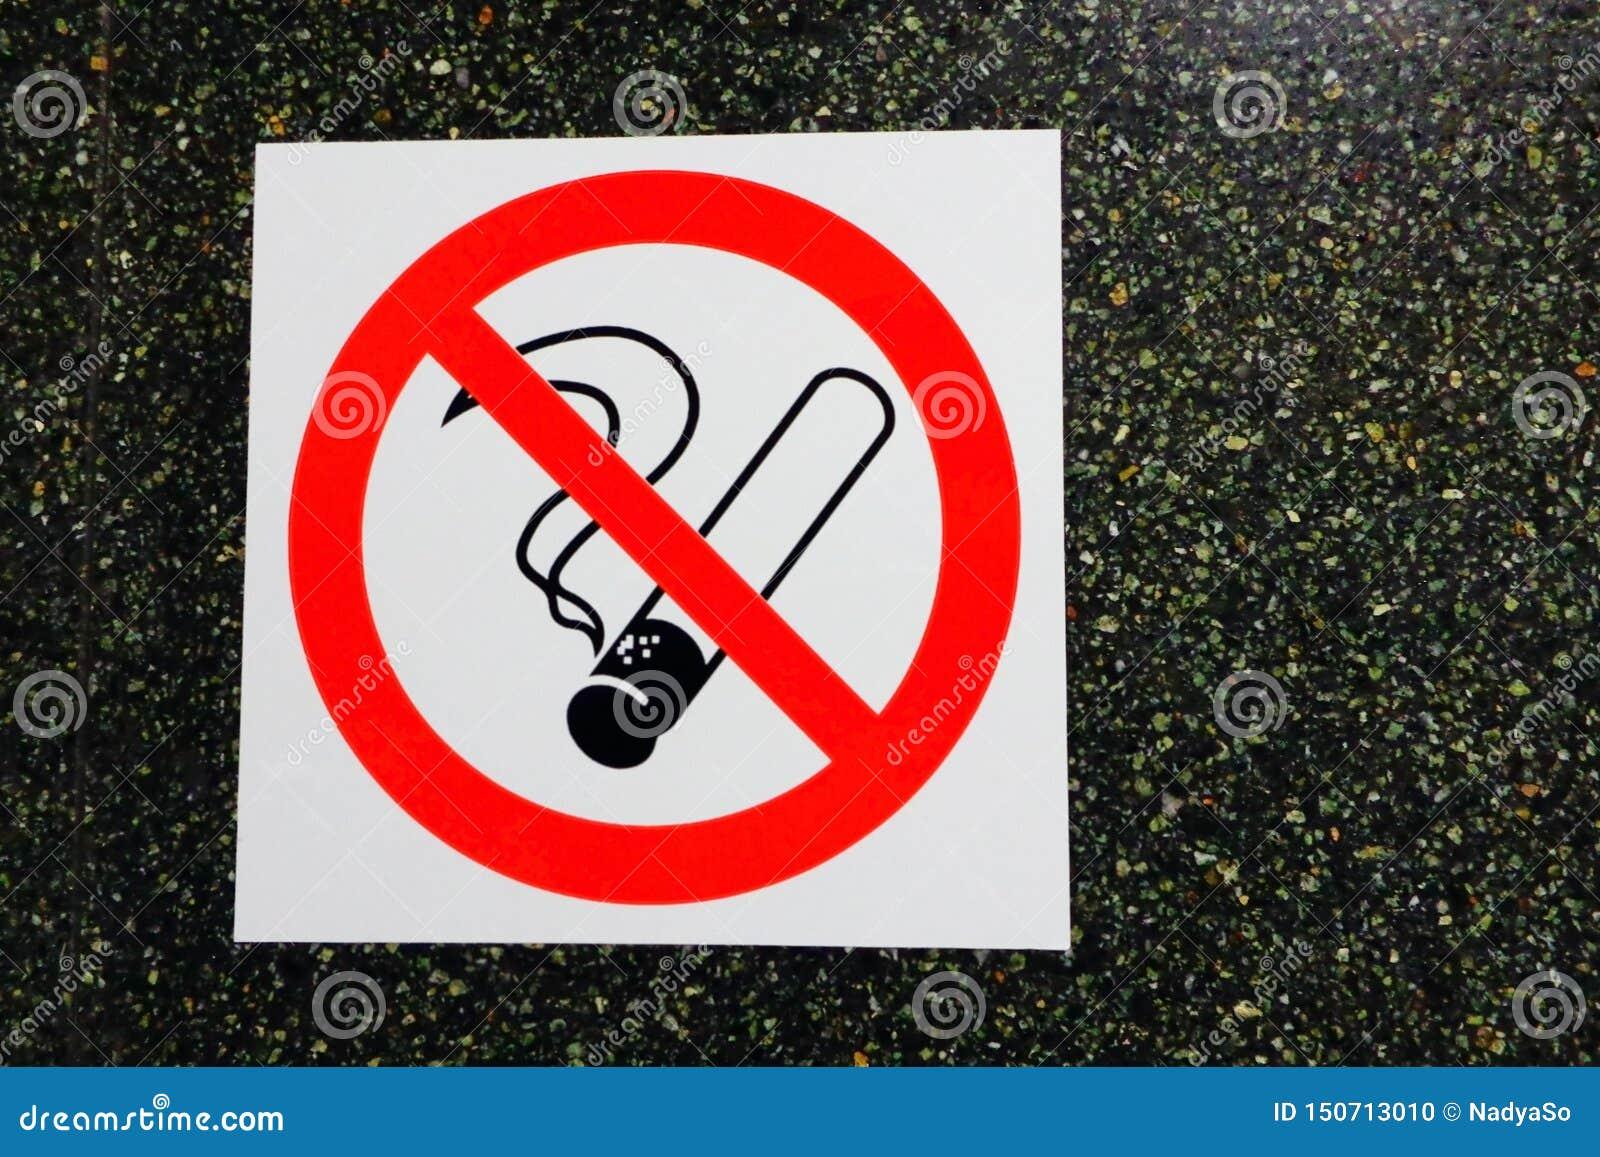 No smoking icon sticker on dark stone wall background